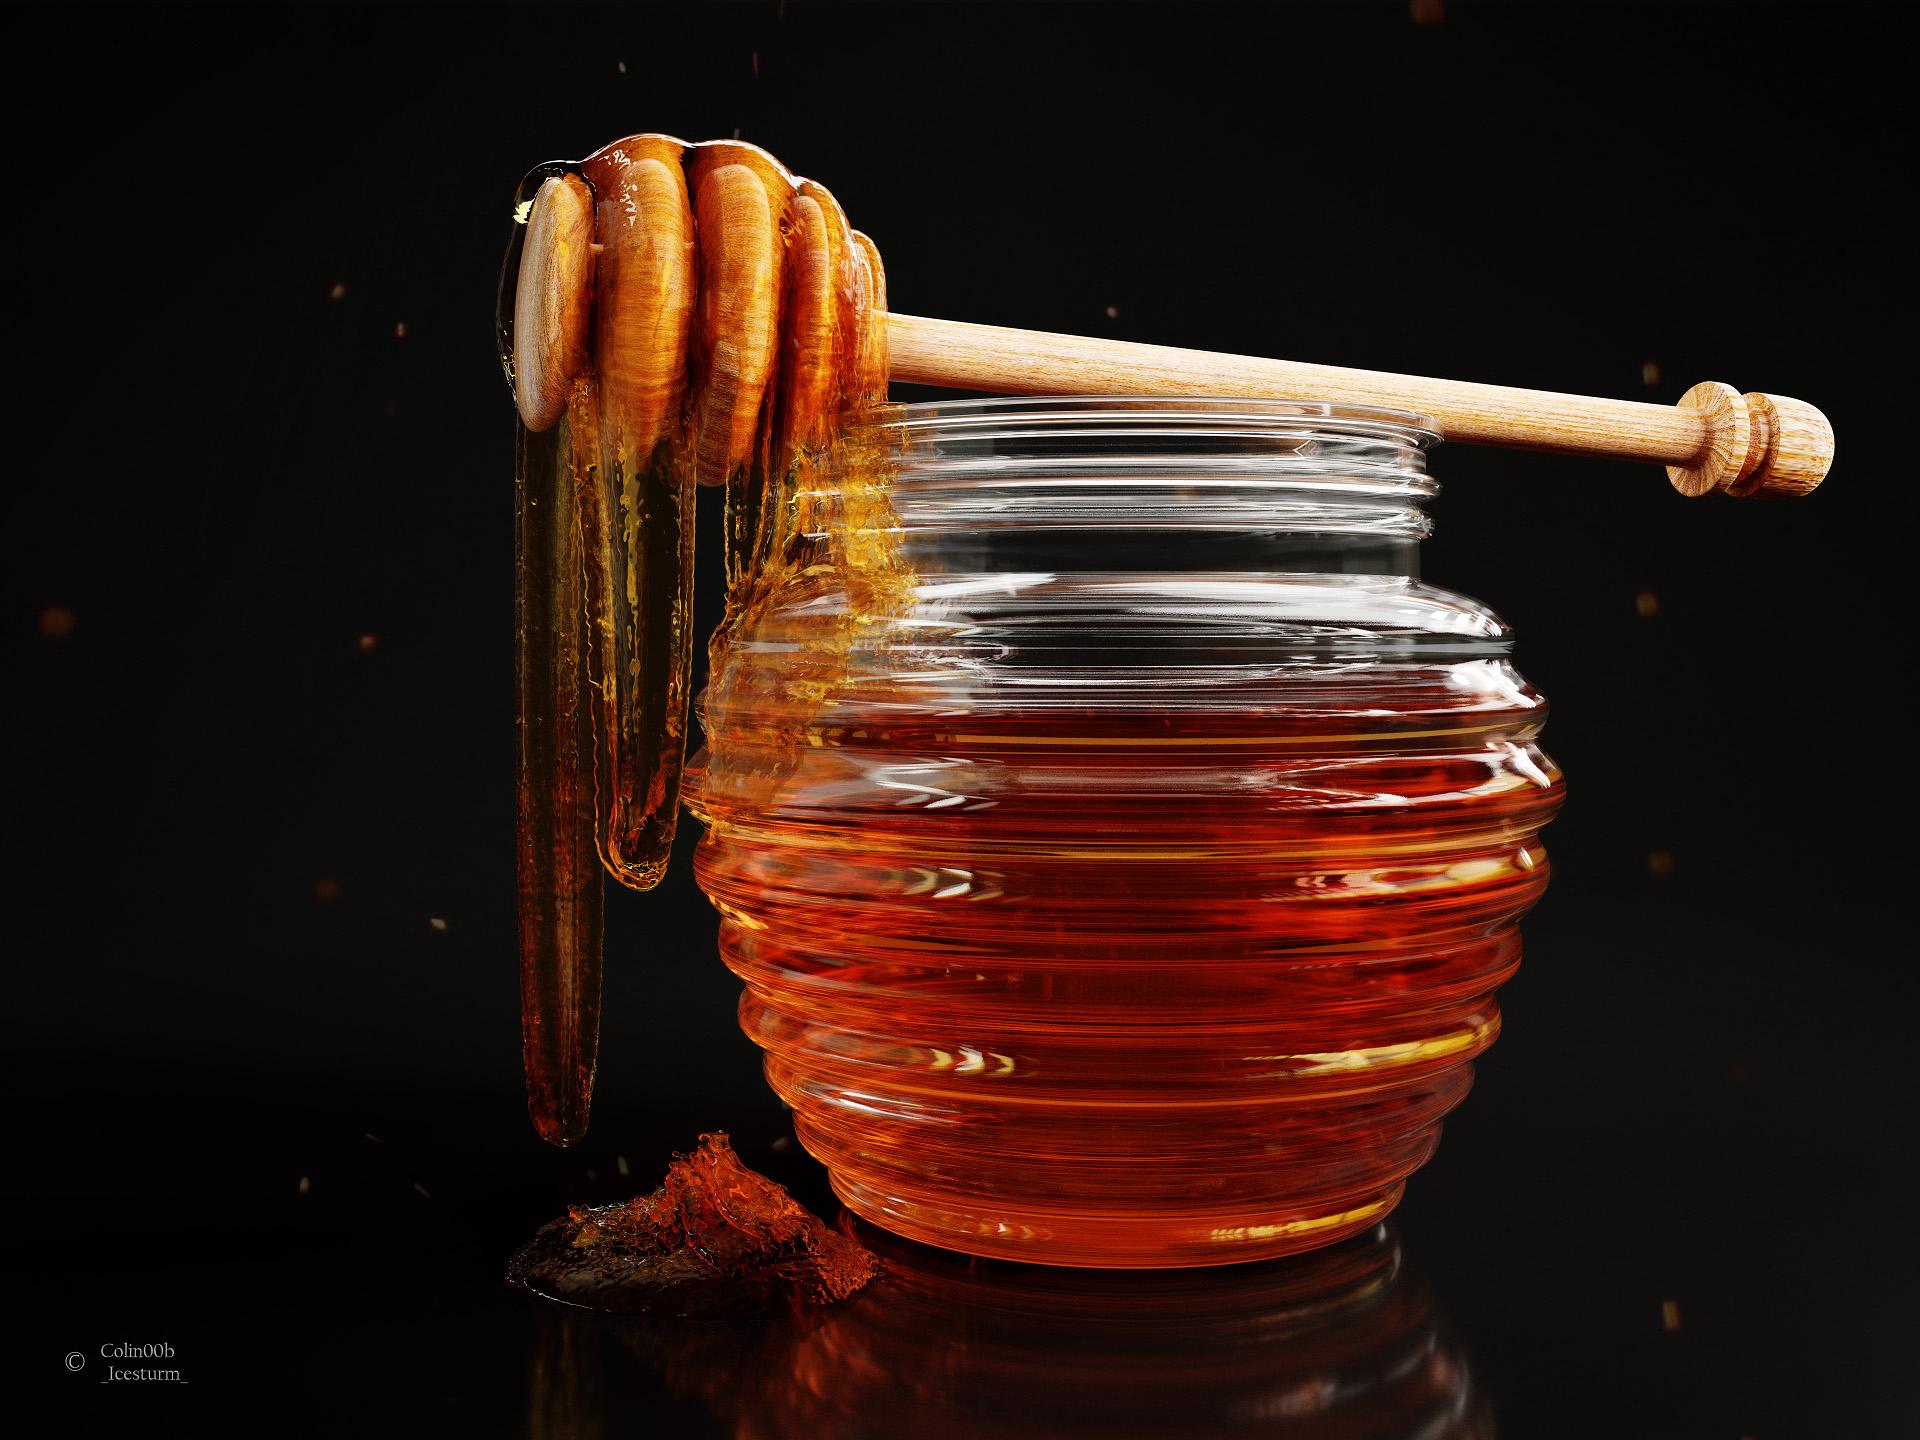 colin_behrens_honigglas